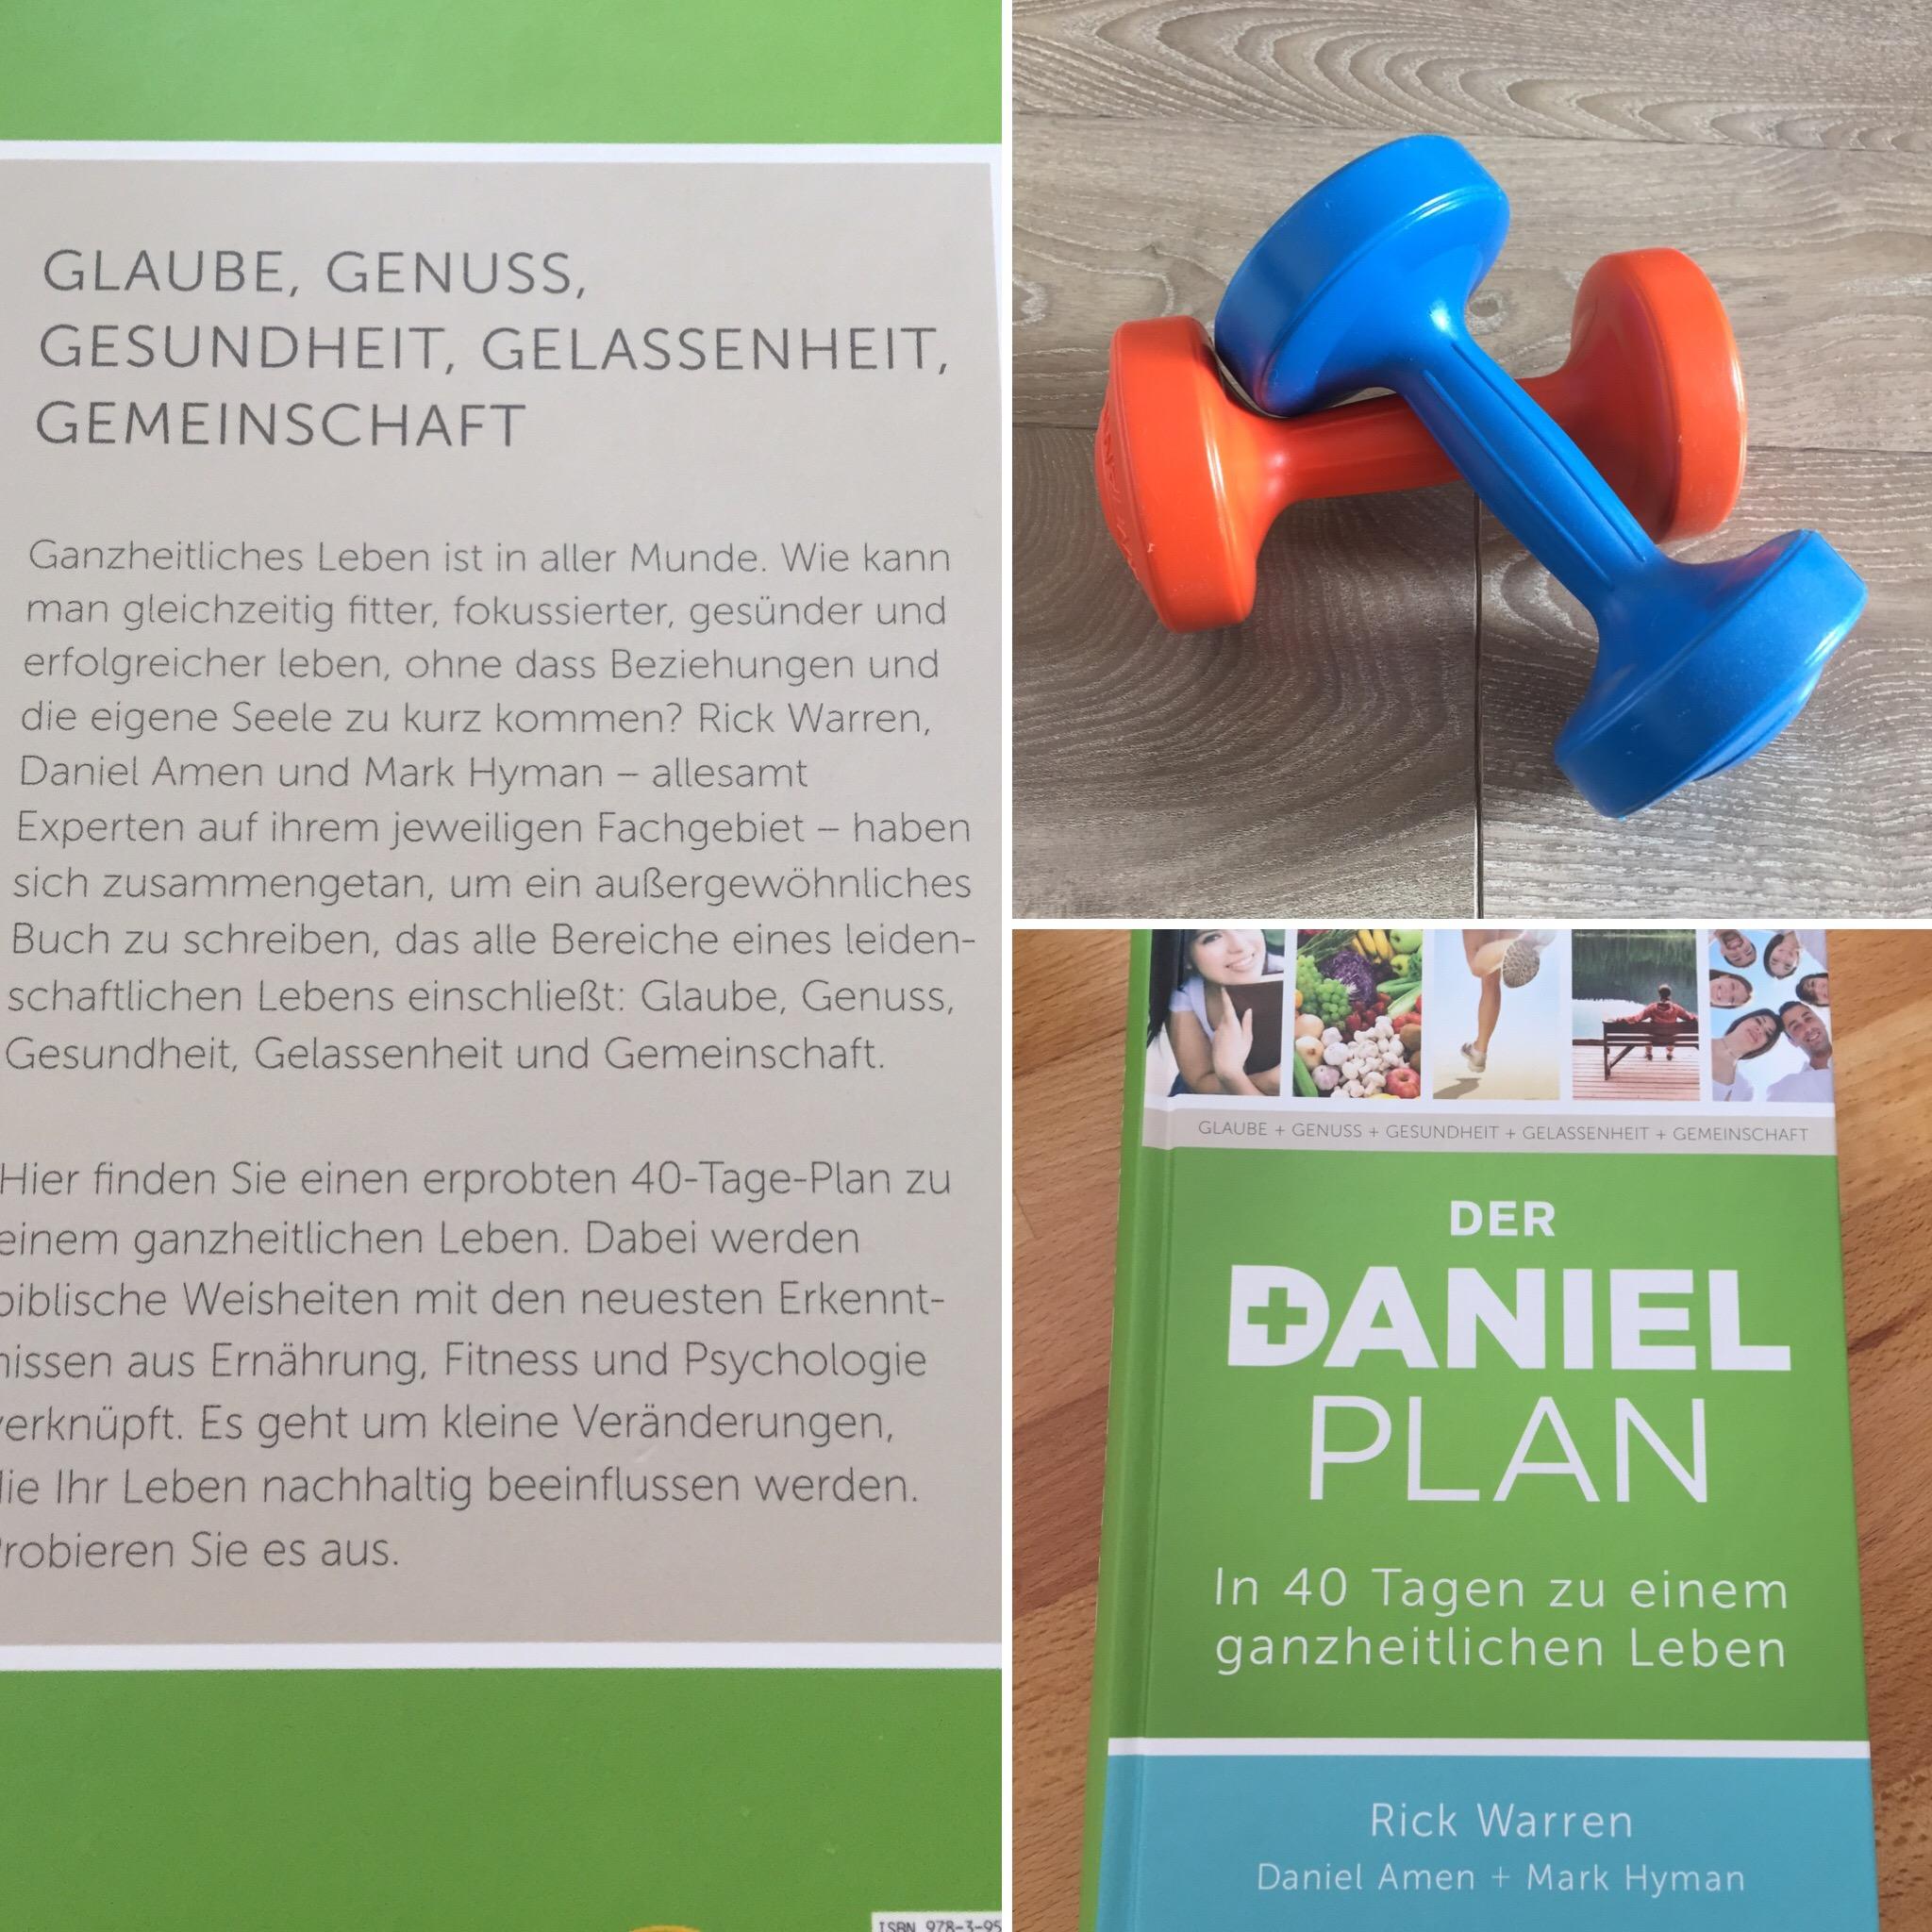 Daniel-Plan